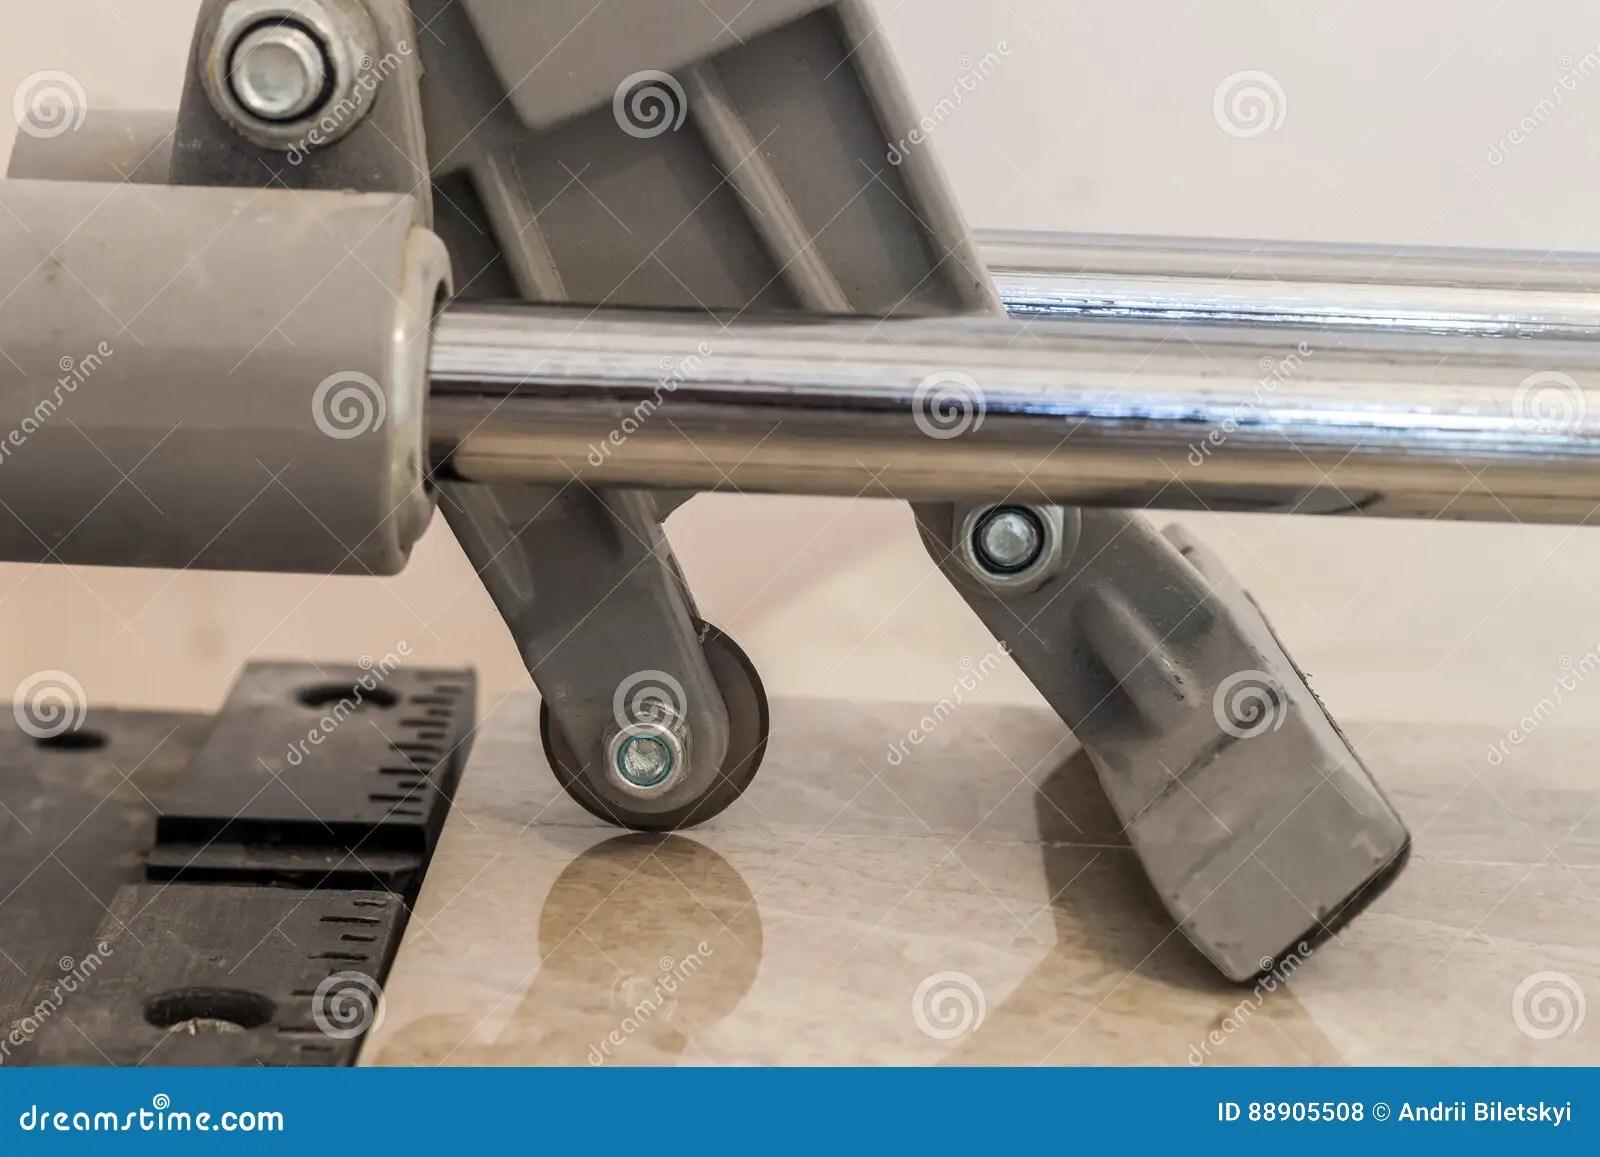 ceramic tiles and tools for tiler floor tiles installation home improvement renovation ceramic tile cutting tool stock photo image of black flooring 88905508